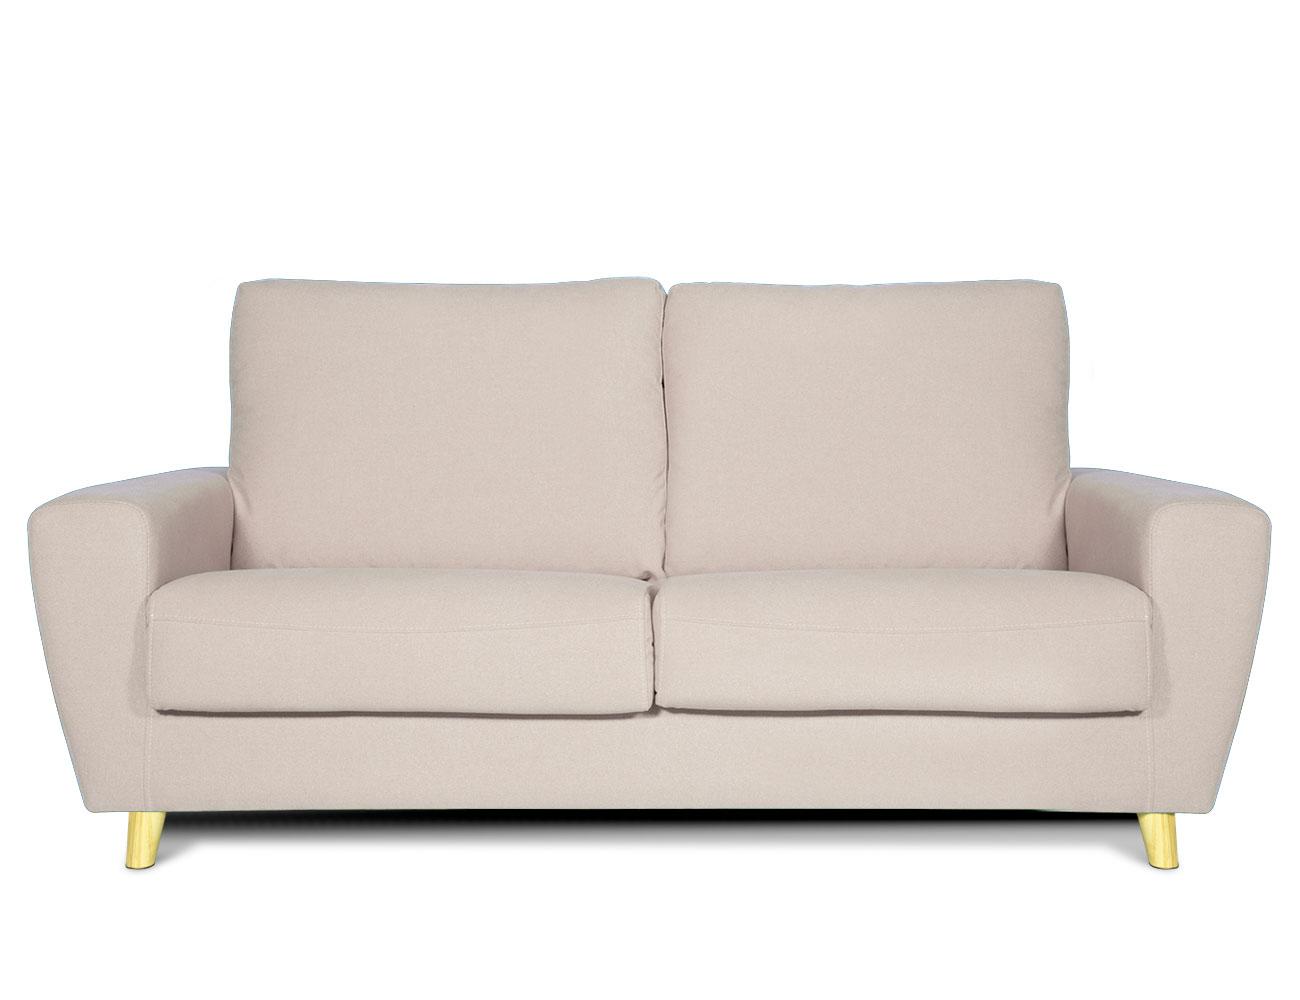 Sofa 3 plazas moderno crema